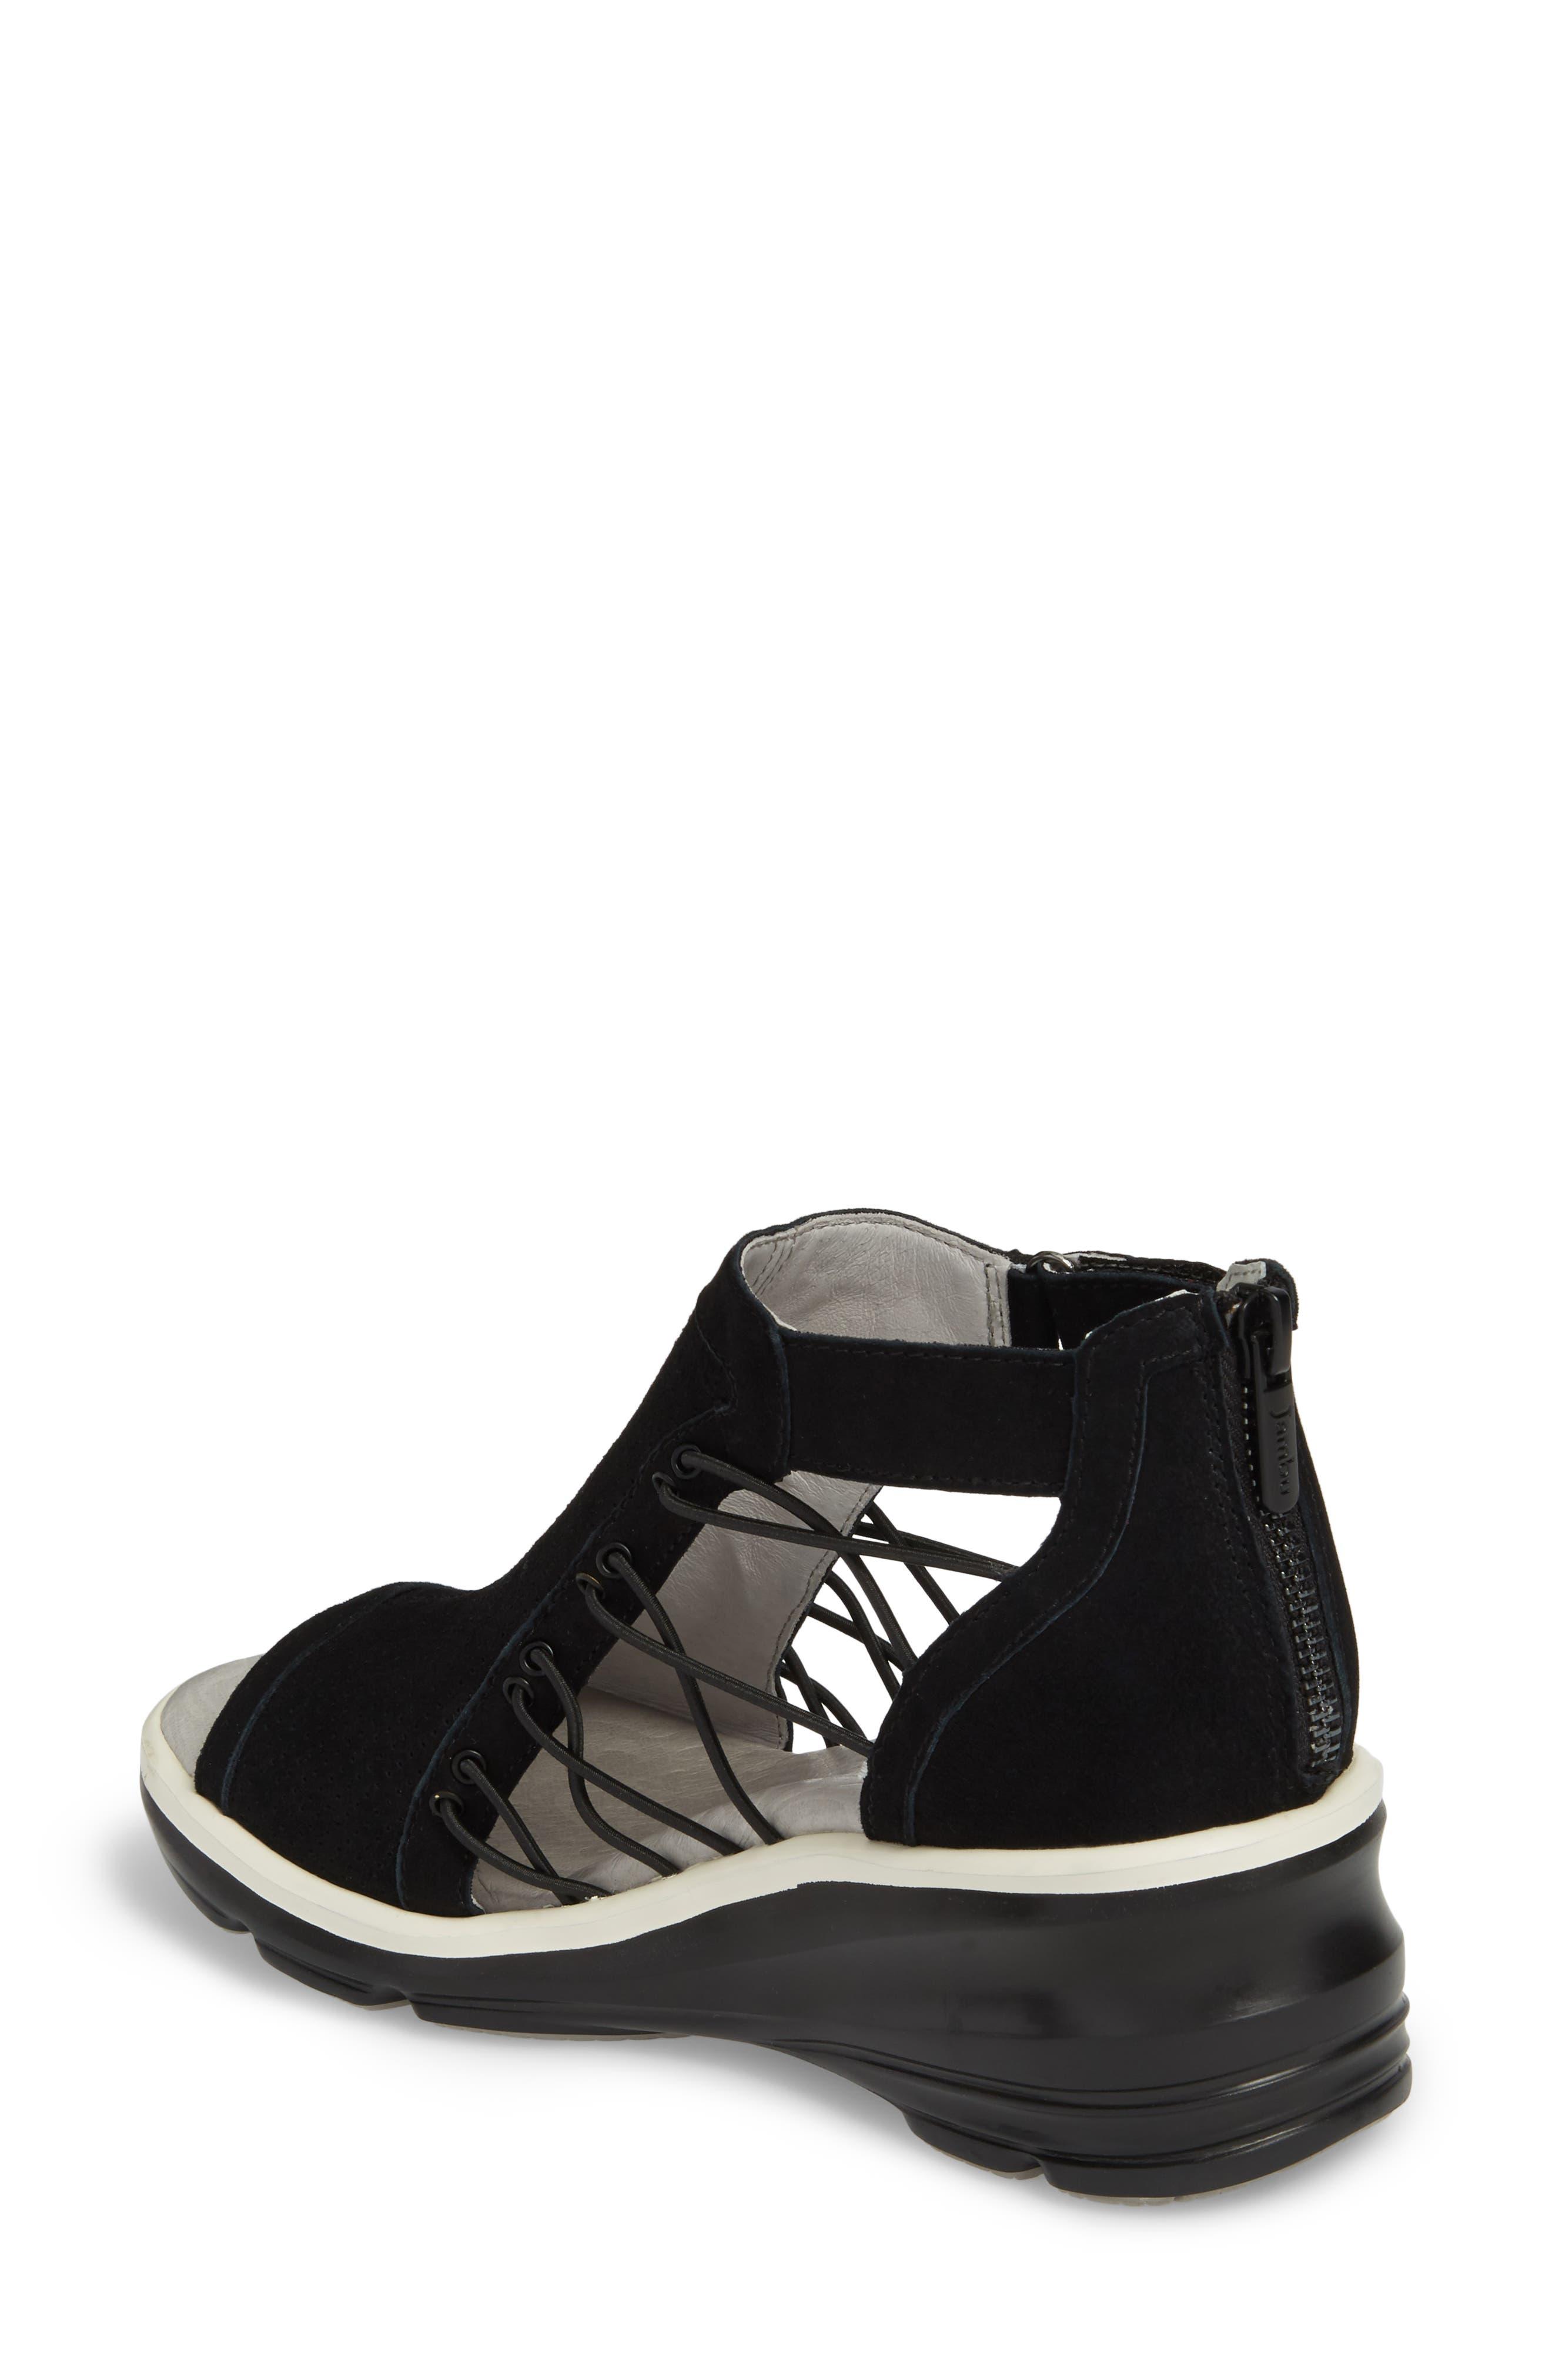 JAMBU, Naomi Perforated Wedge Sandal, Alternate thumbnail 2, color, BLACK SUEDE